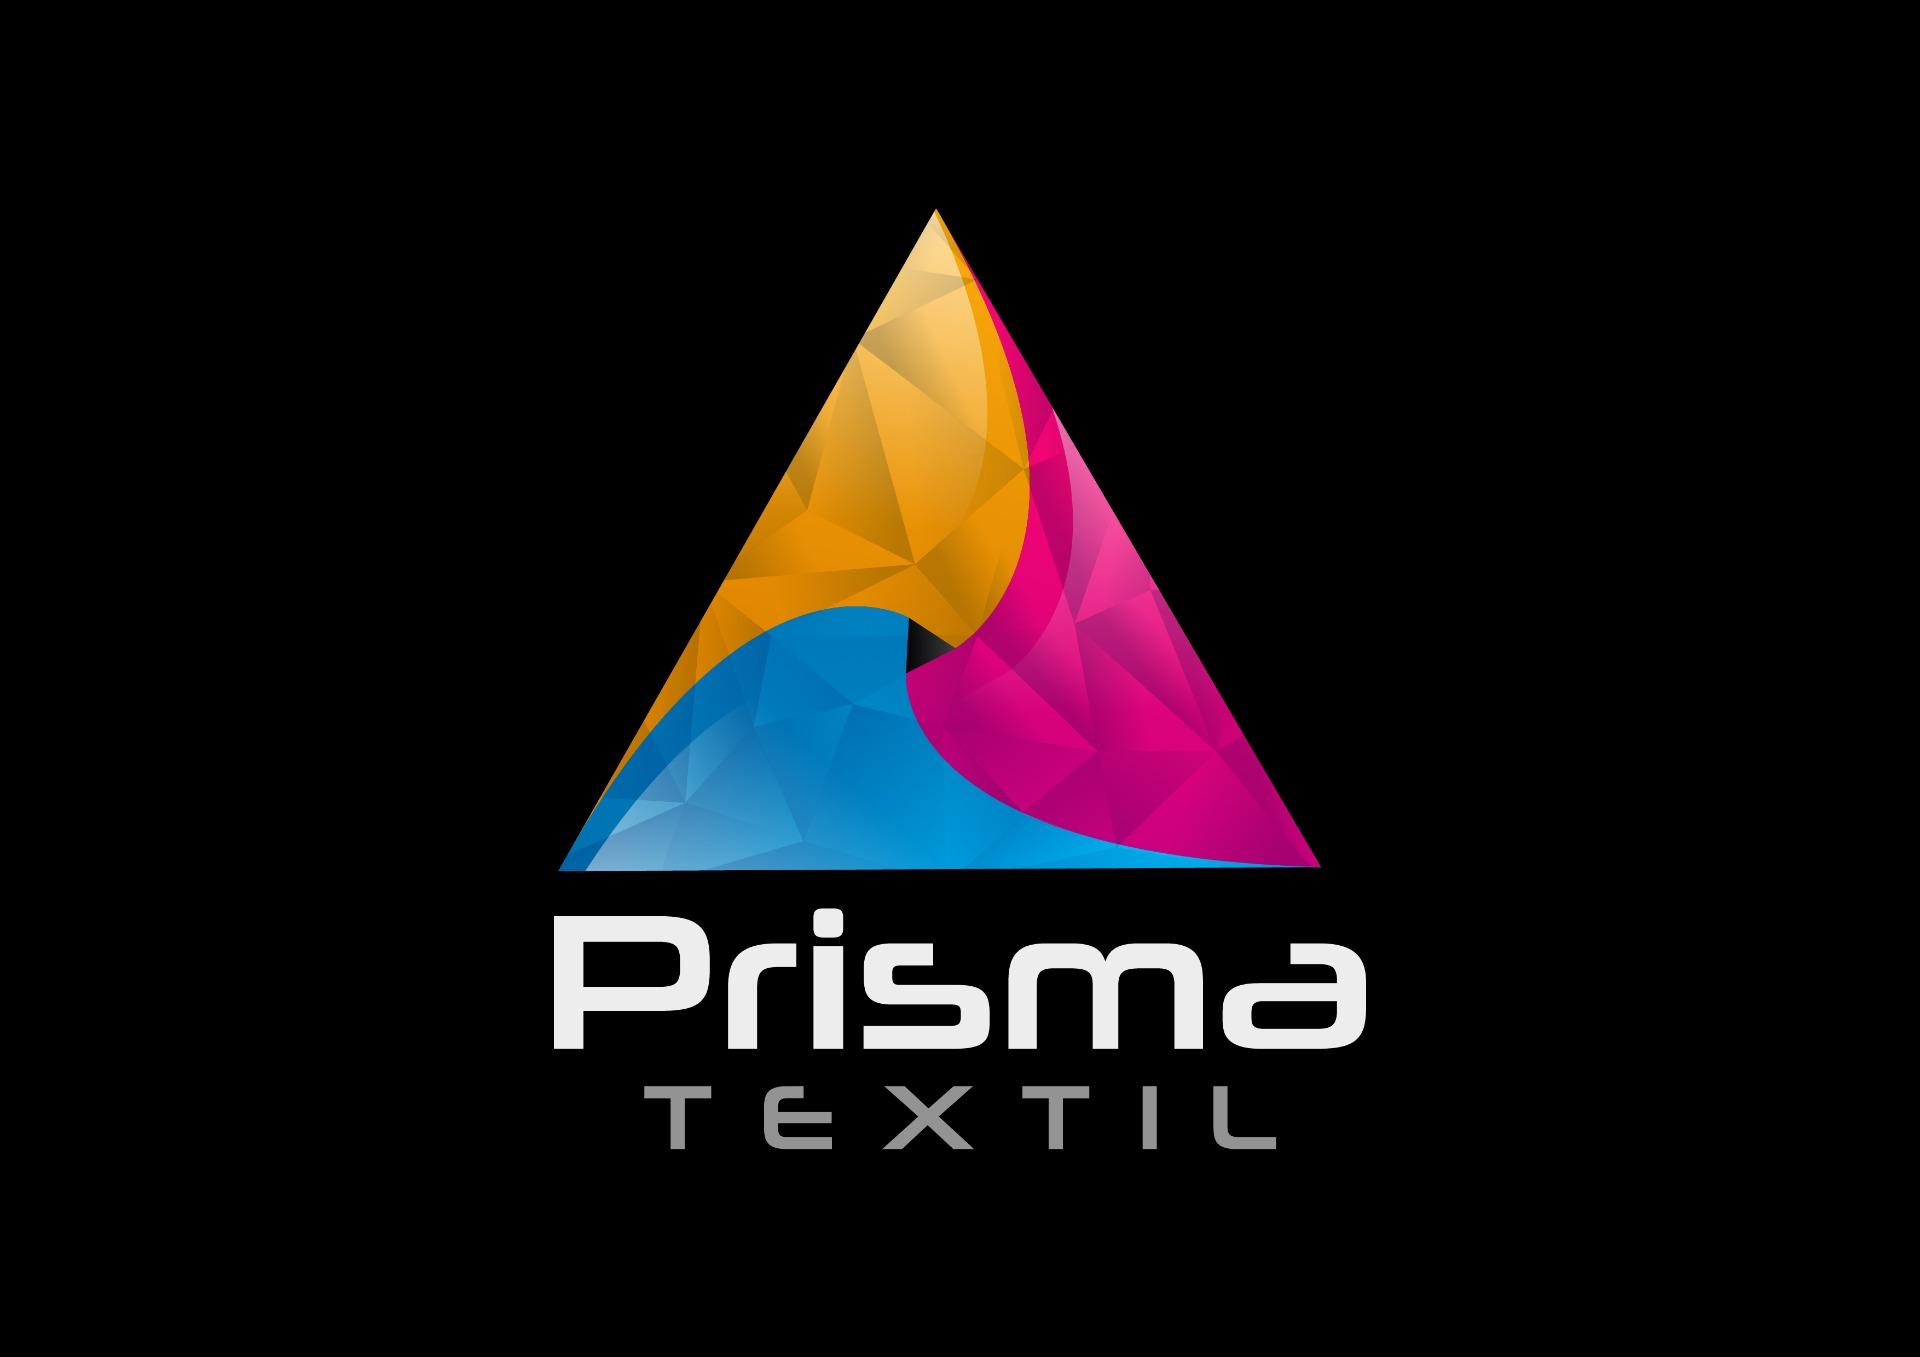 PRISMA TEXTIL